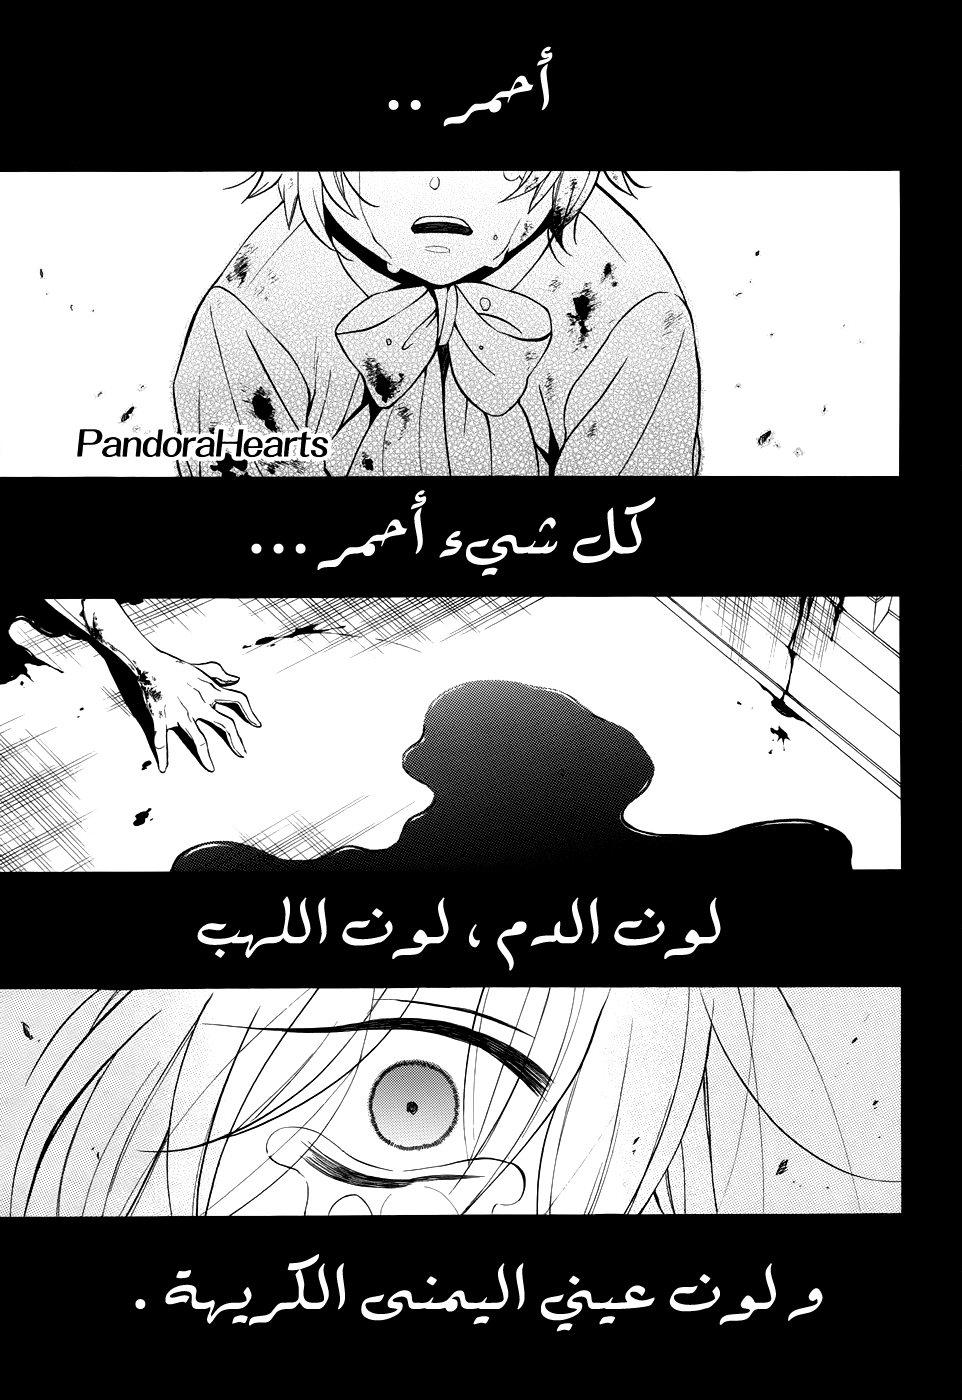 miley_cyrus_manga_mexat_panadora_hearts_000000000000000x_manga-ar0001